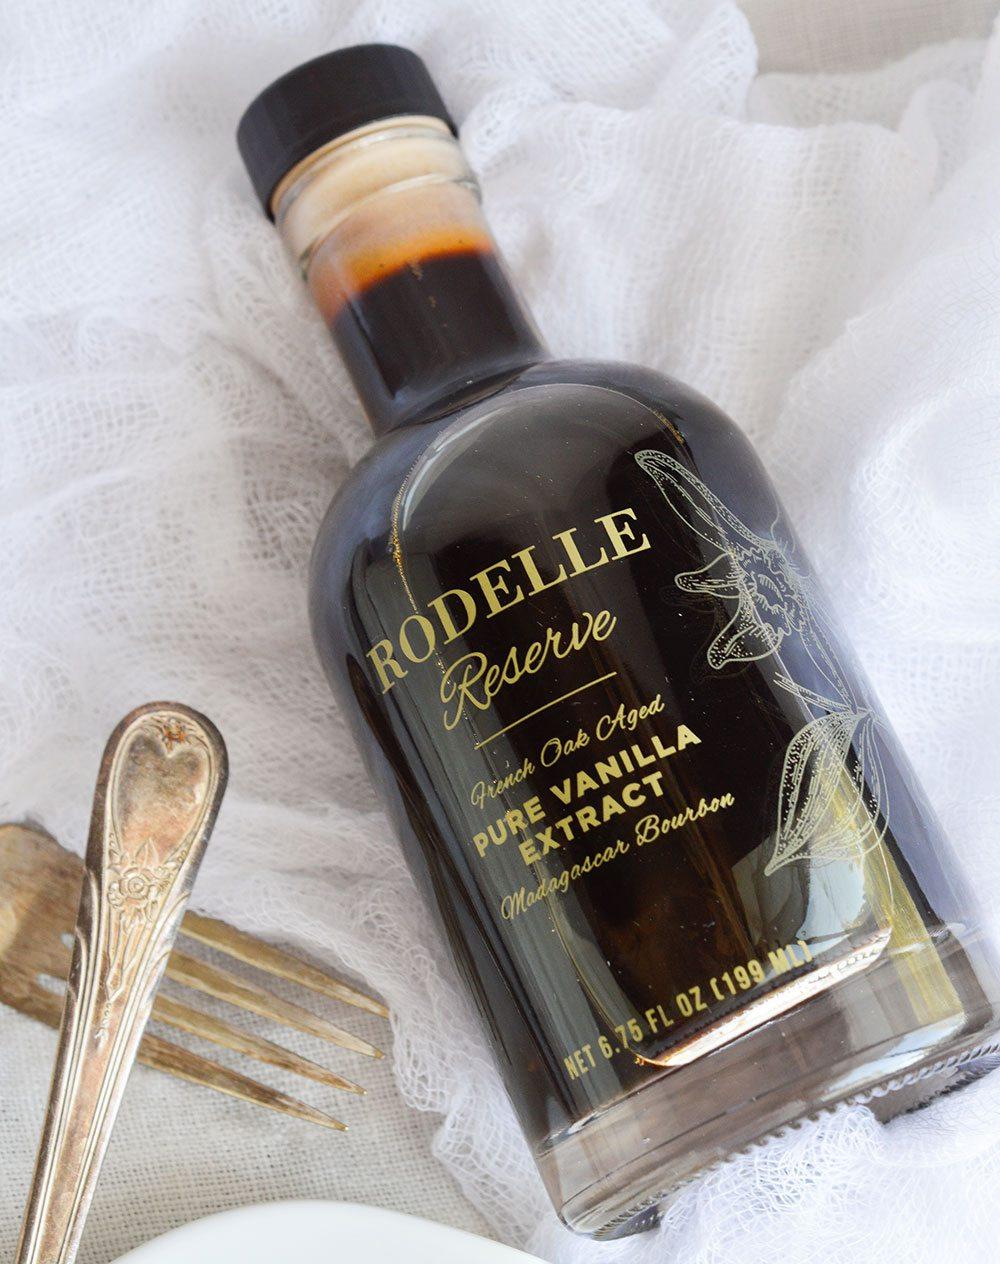 Rodelle Reserve